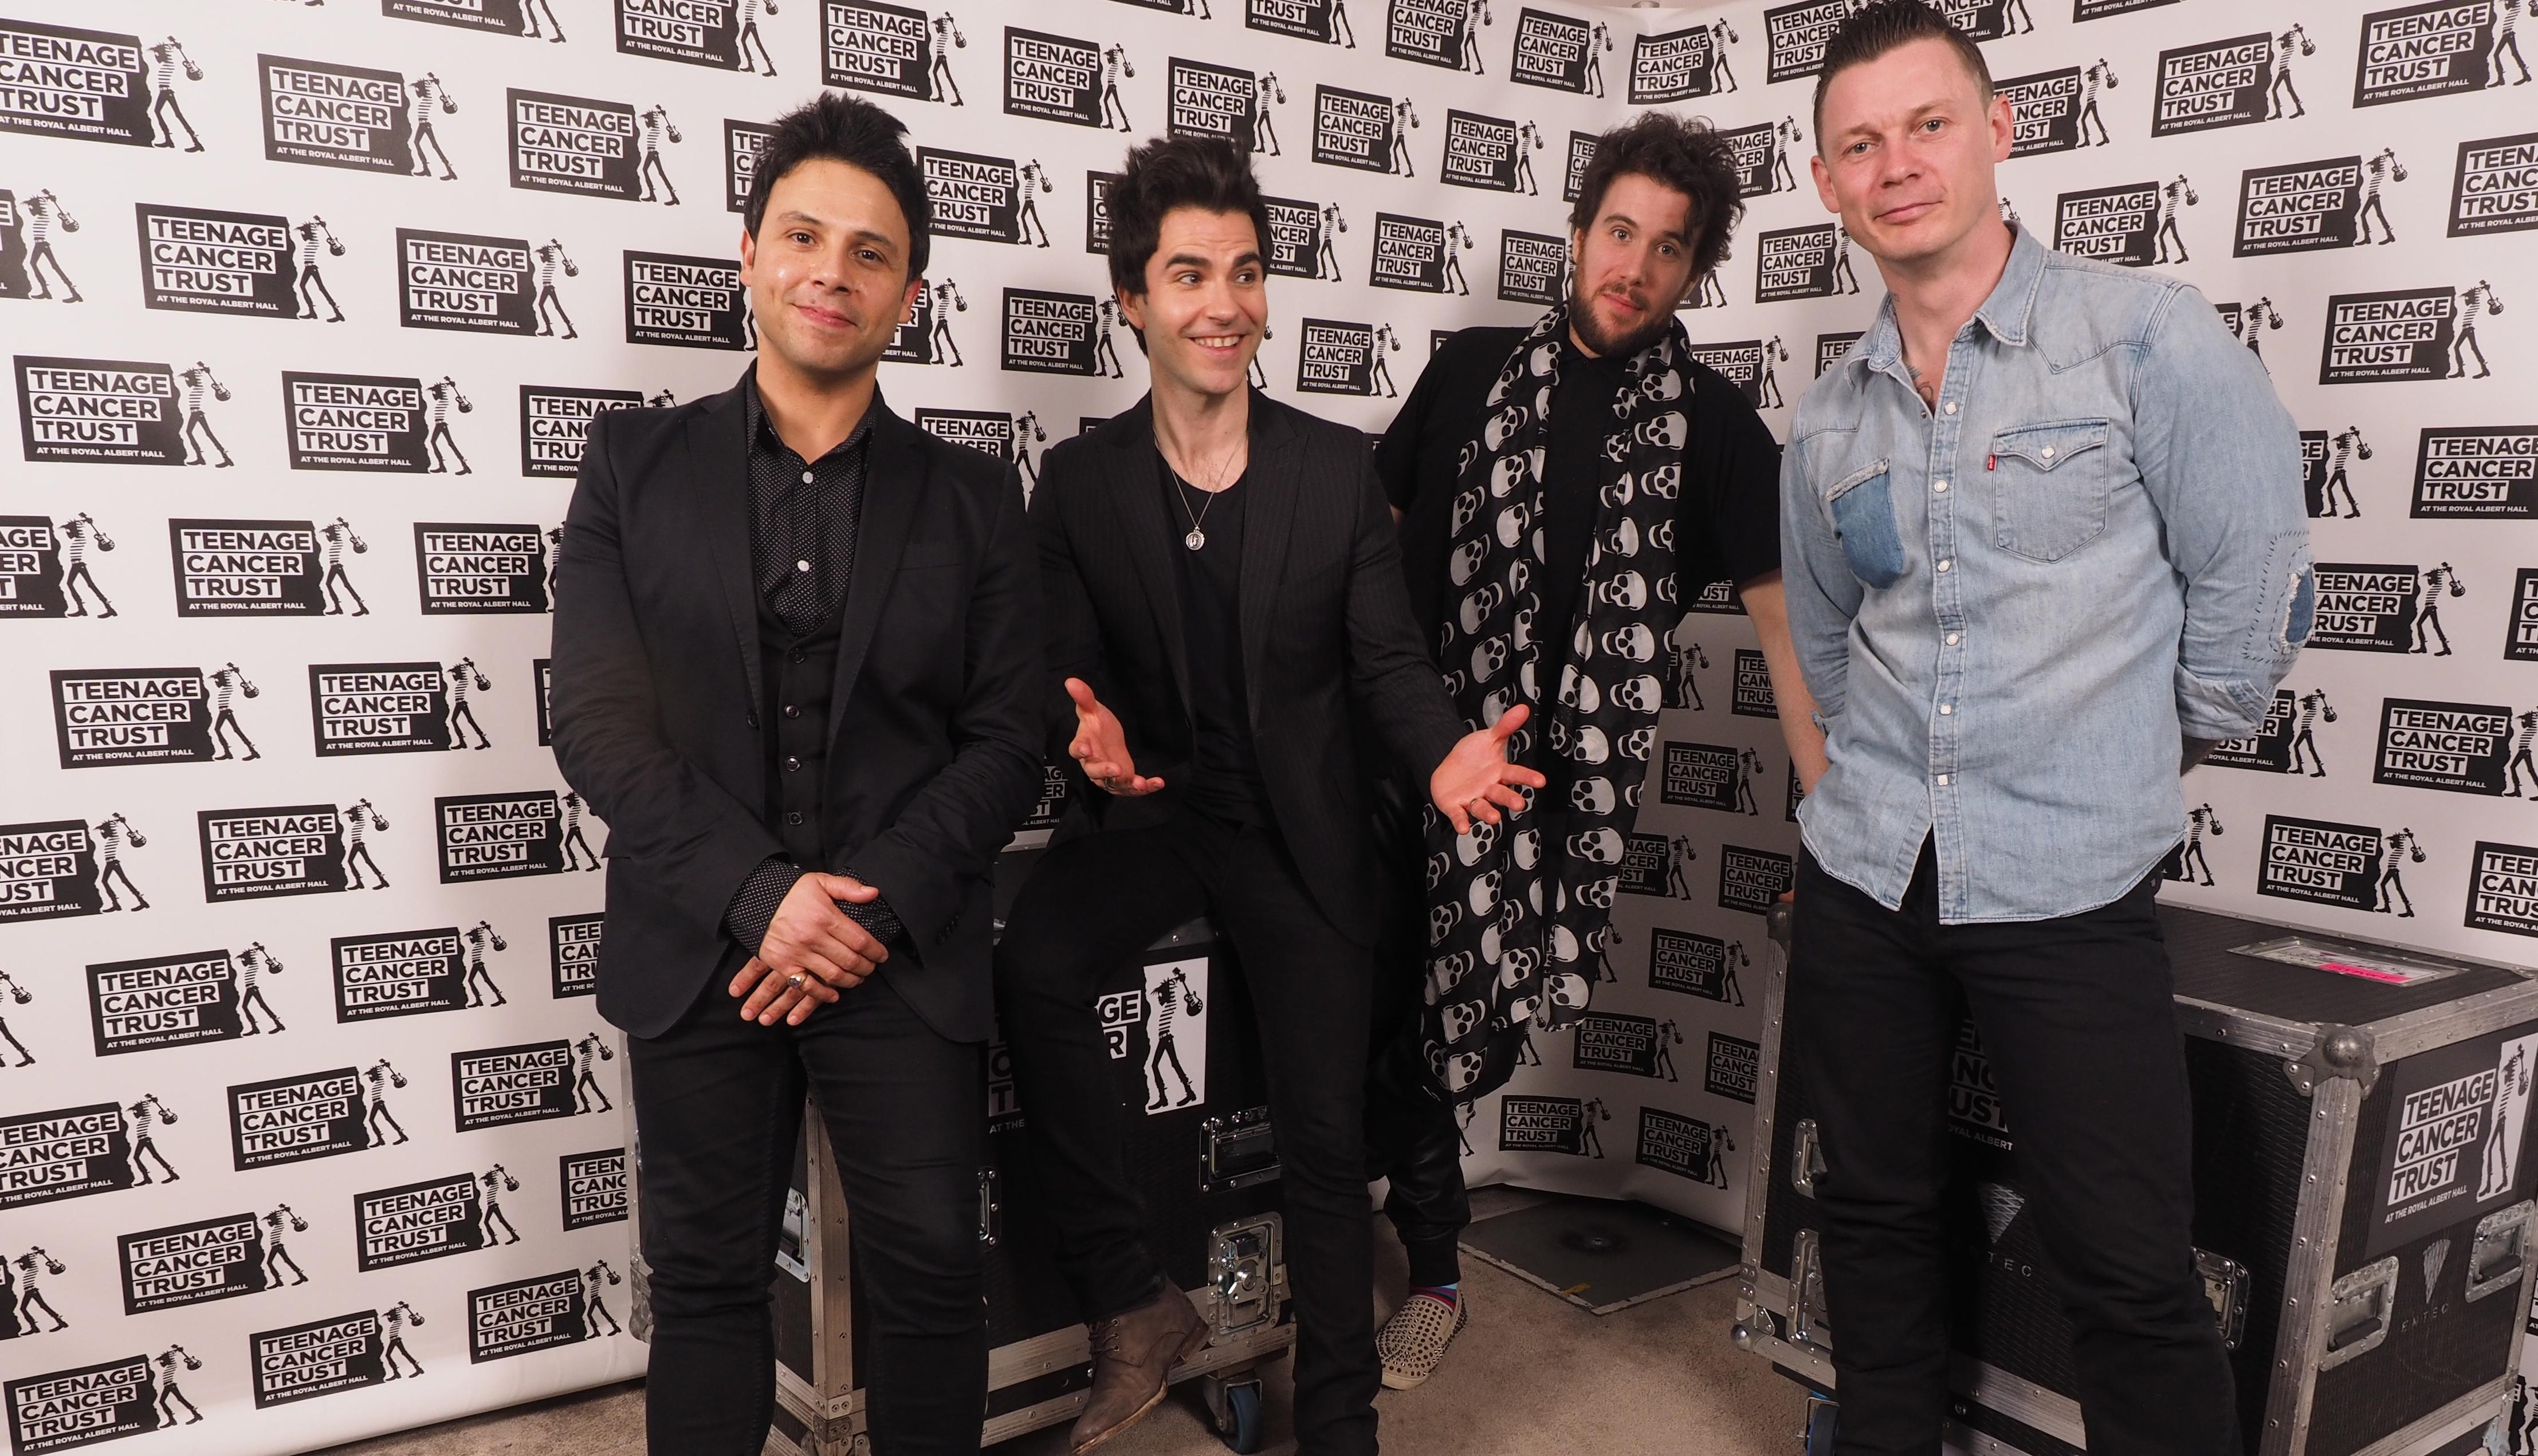 LONDON, ENGLAND - MARCH 23: (L-R) Adam Zindani, Kelly Jones, Jamie Morrison and Richard Jones of the Stereophonics perform fo